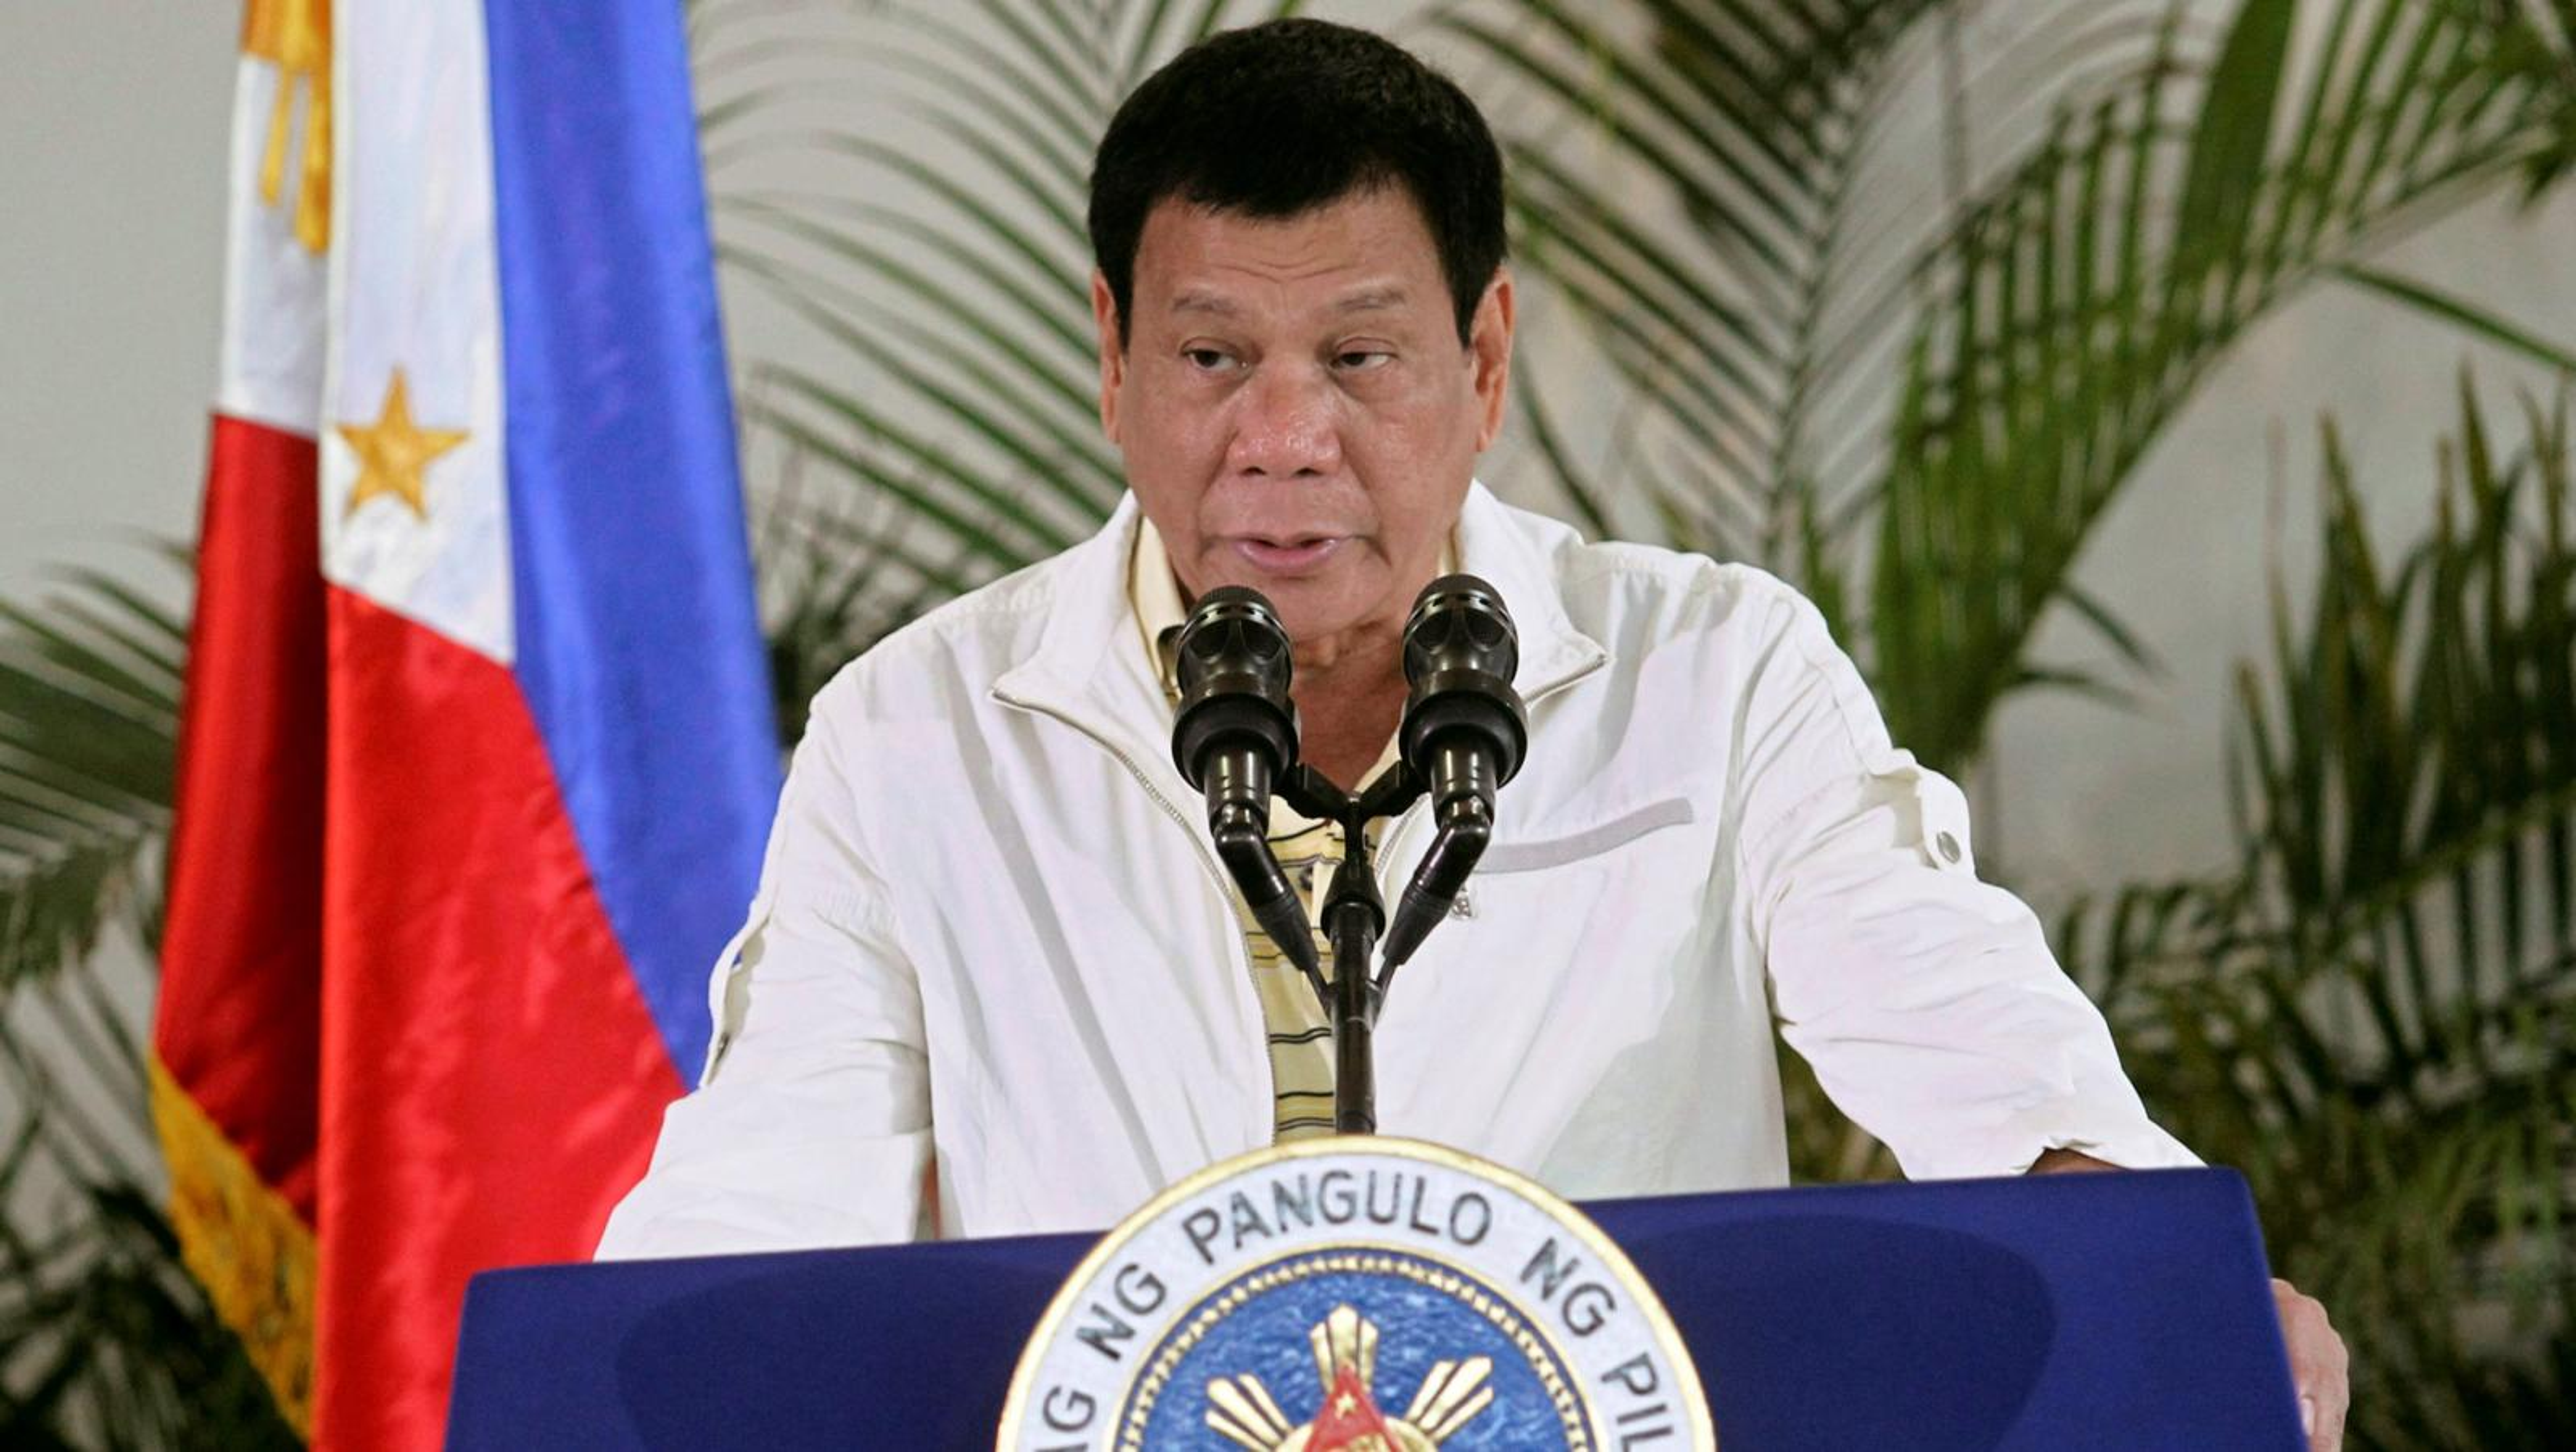 Philippines president Rodrigo Duterte picked the wrong week to call ...